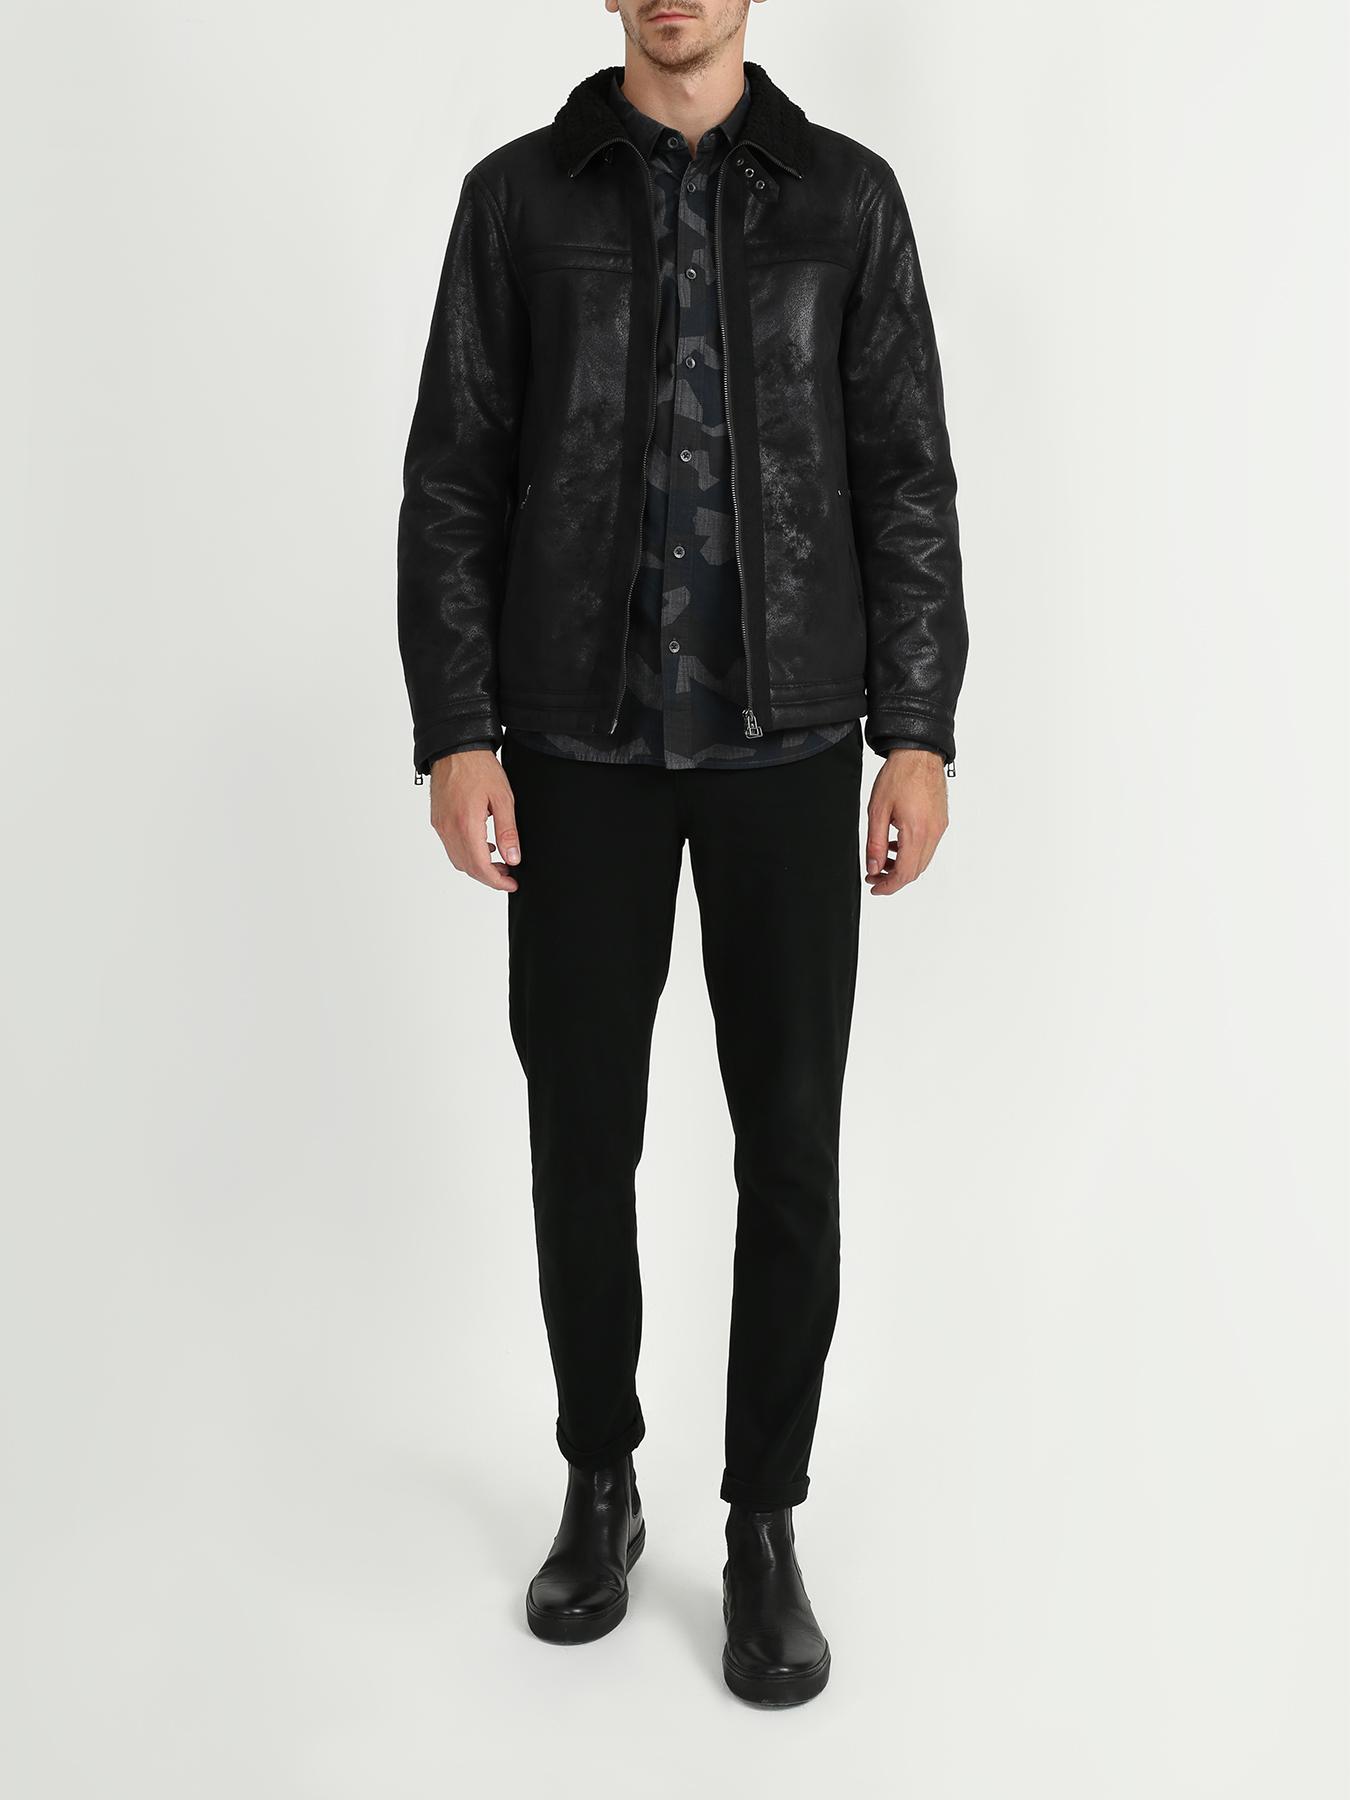 Куртка Armani Exchange Мужская дубленка 12storeez дубленка с лацканами бежевый